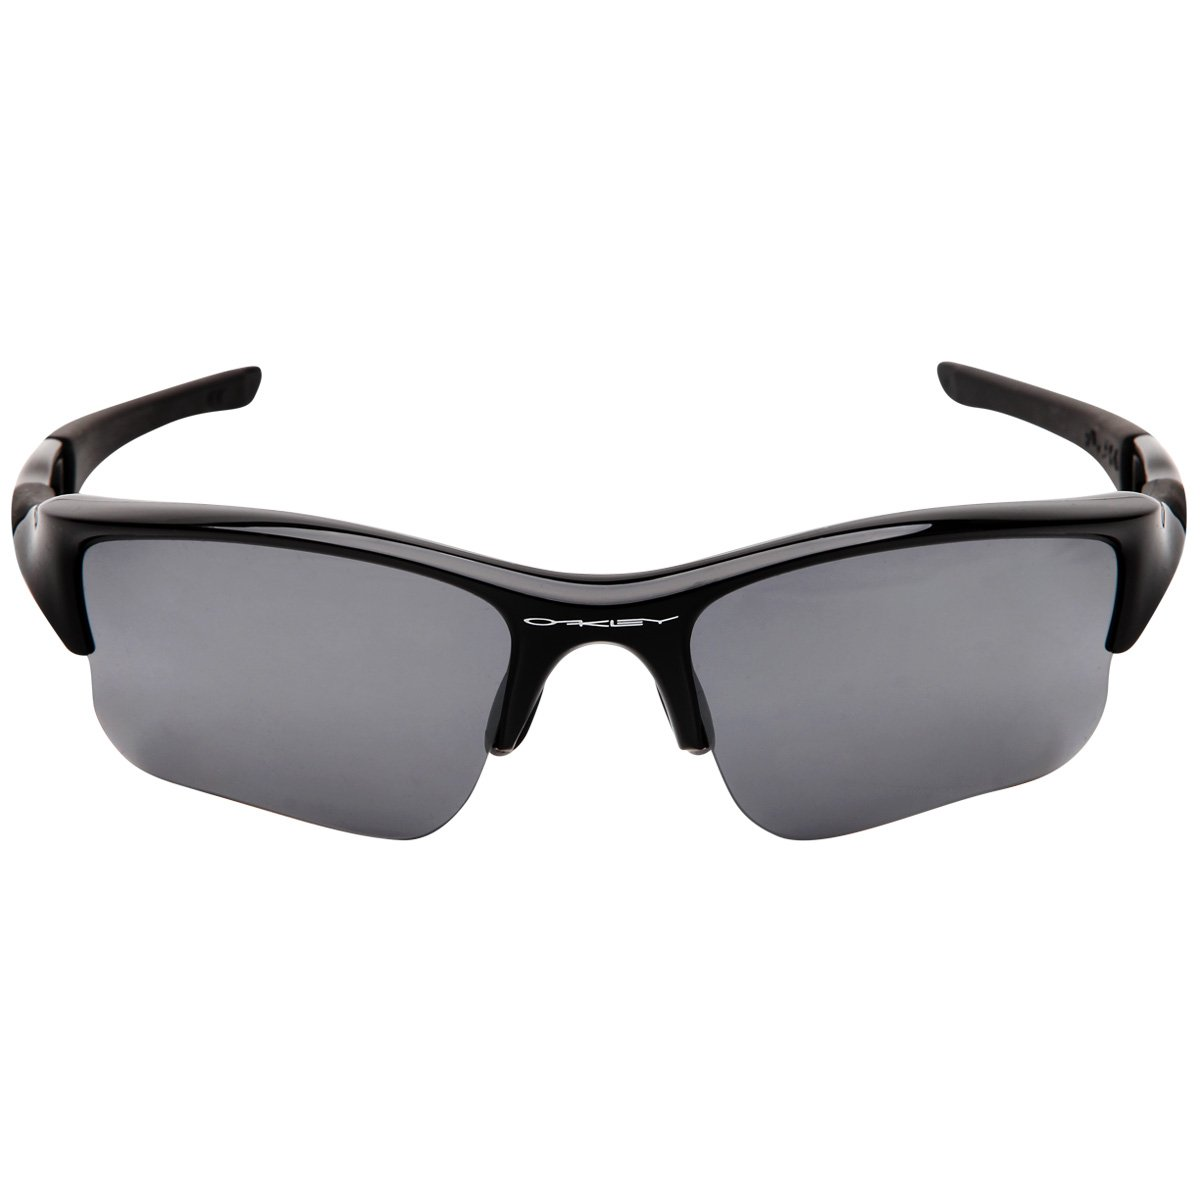 Óculos Oakley Flak Jacket XLJ - Compre Agora   Netshoes c603240b4a